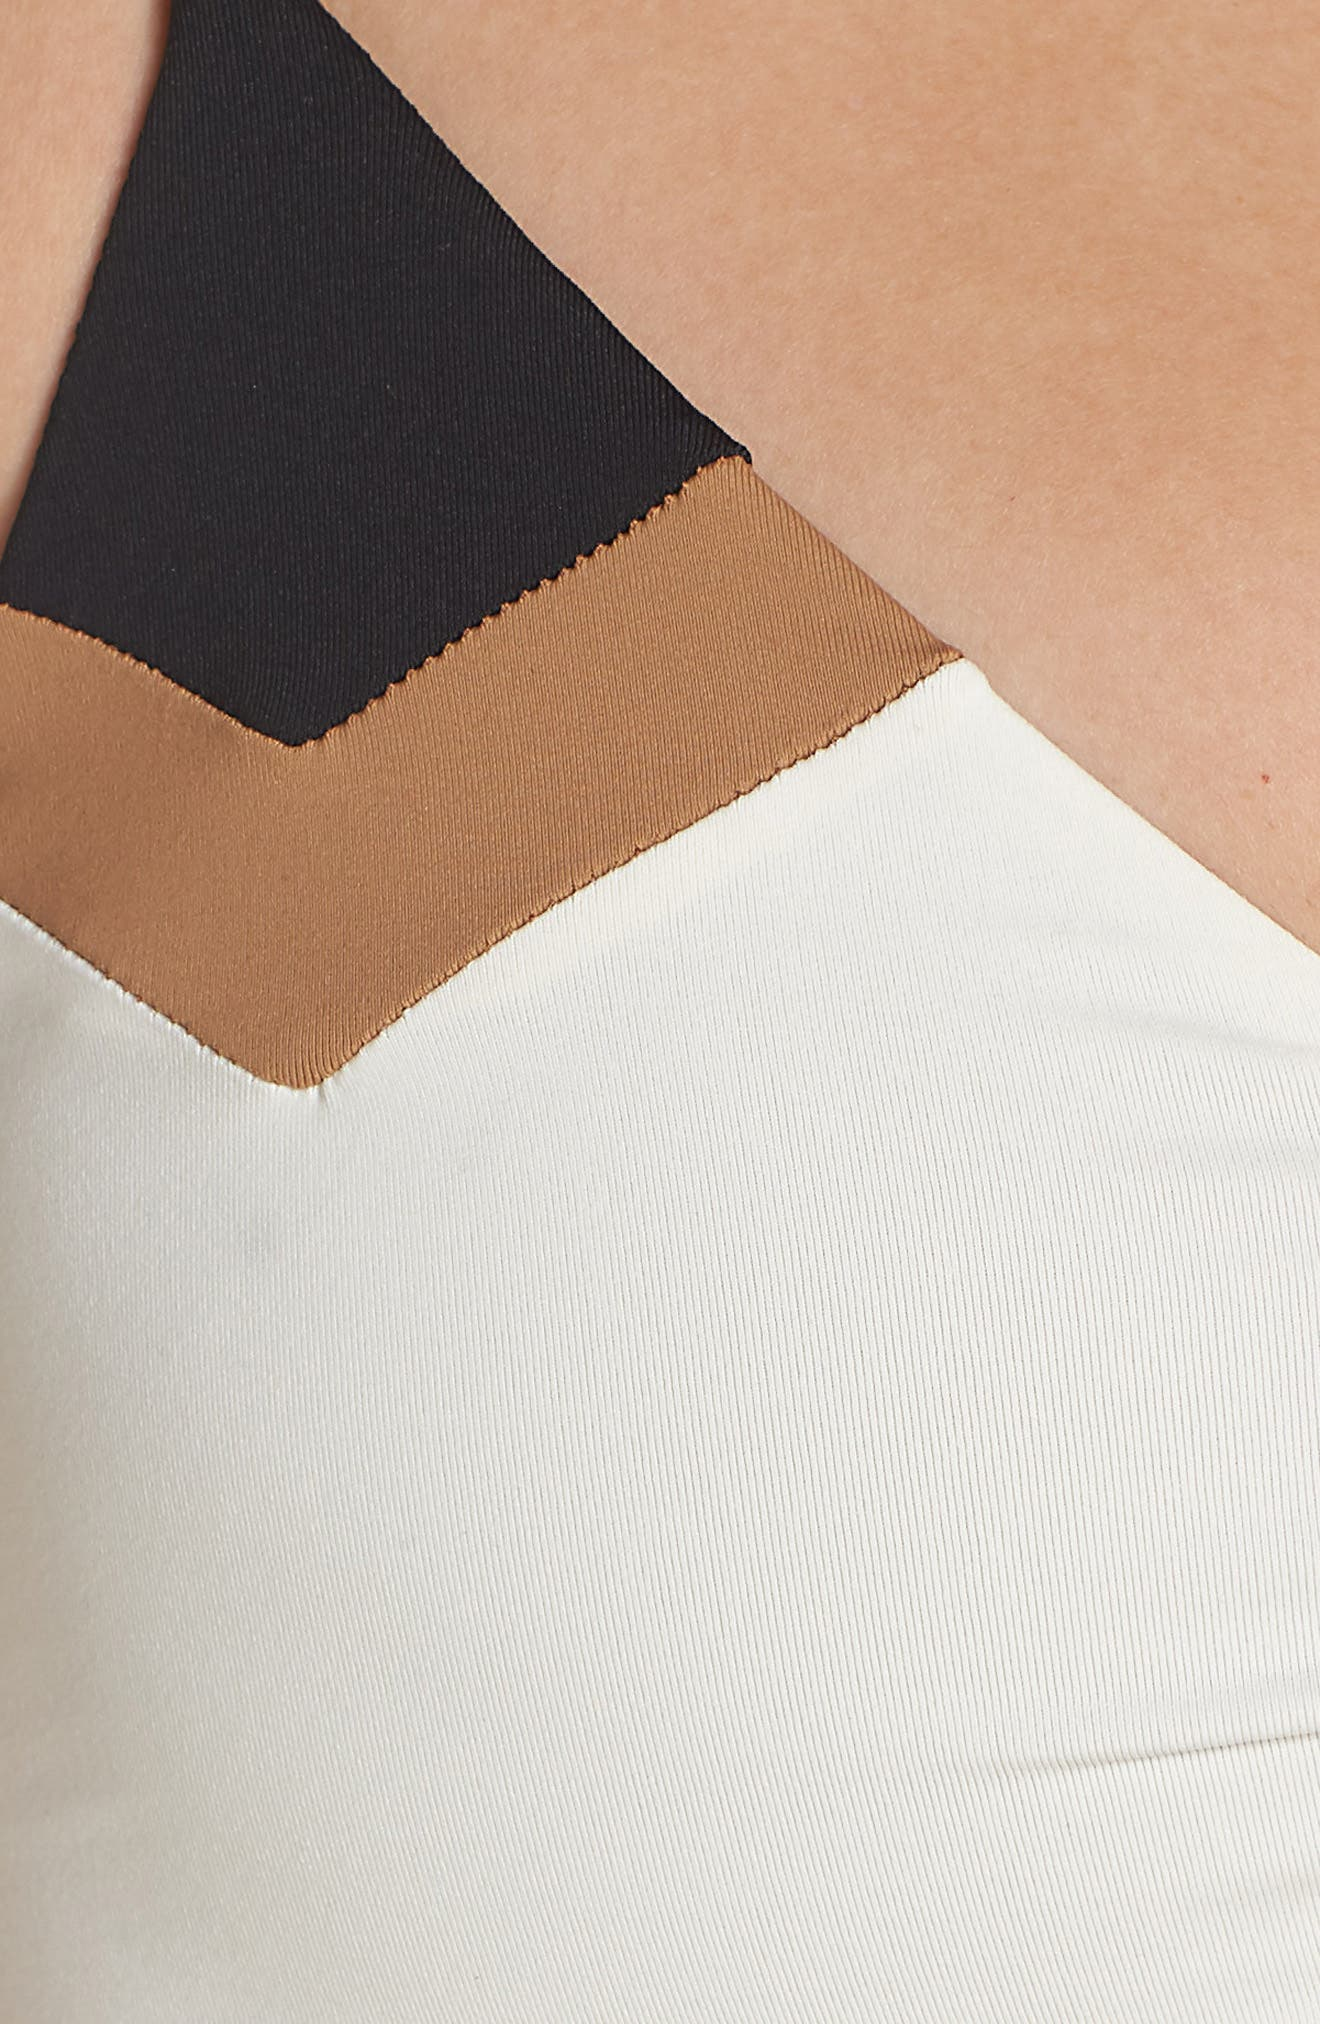 L SPACE, 'Haley' Reversible Bikini Top, Alternate thumbnail 5, color, 109